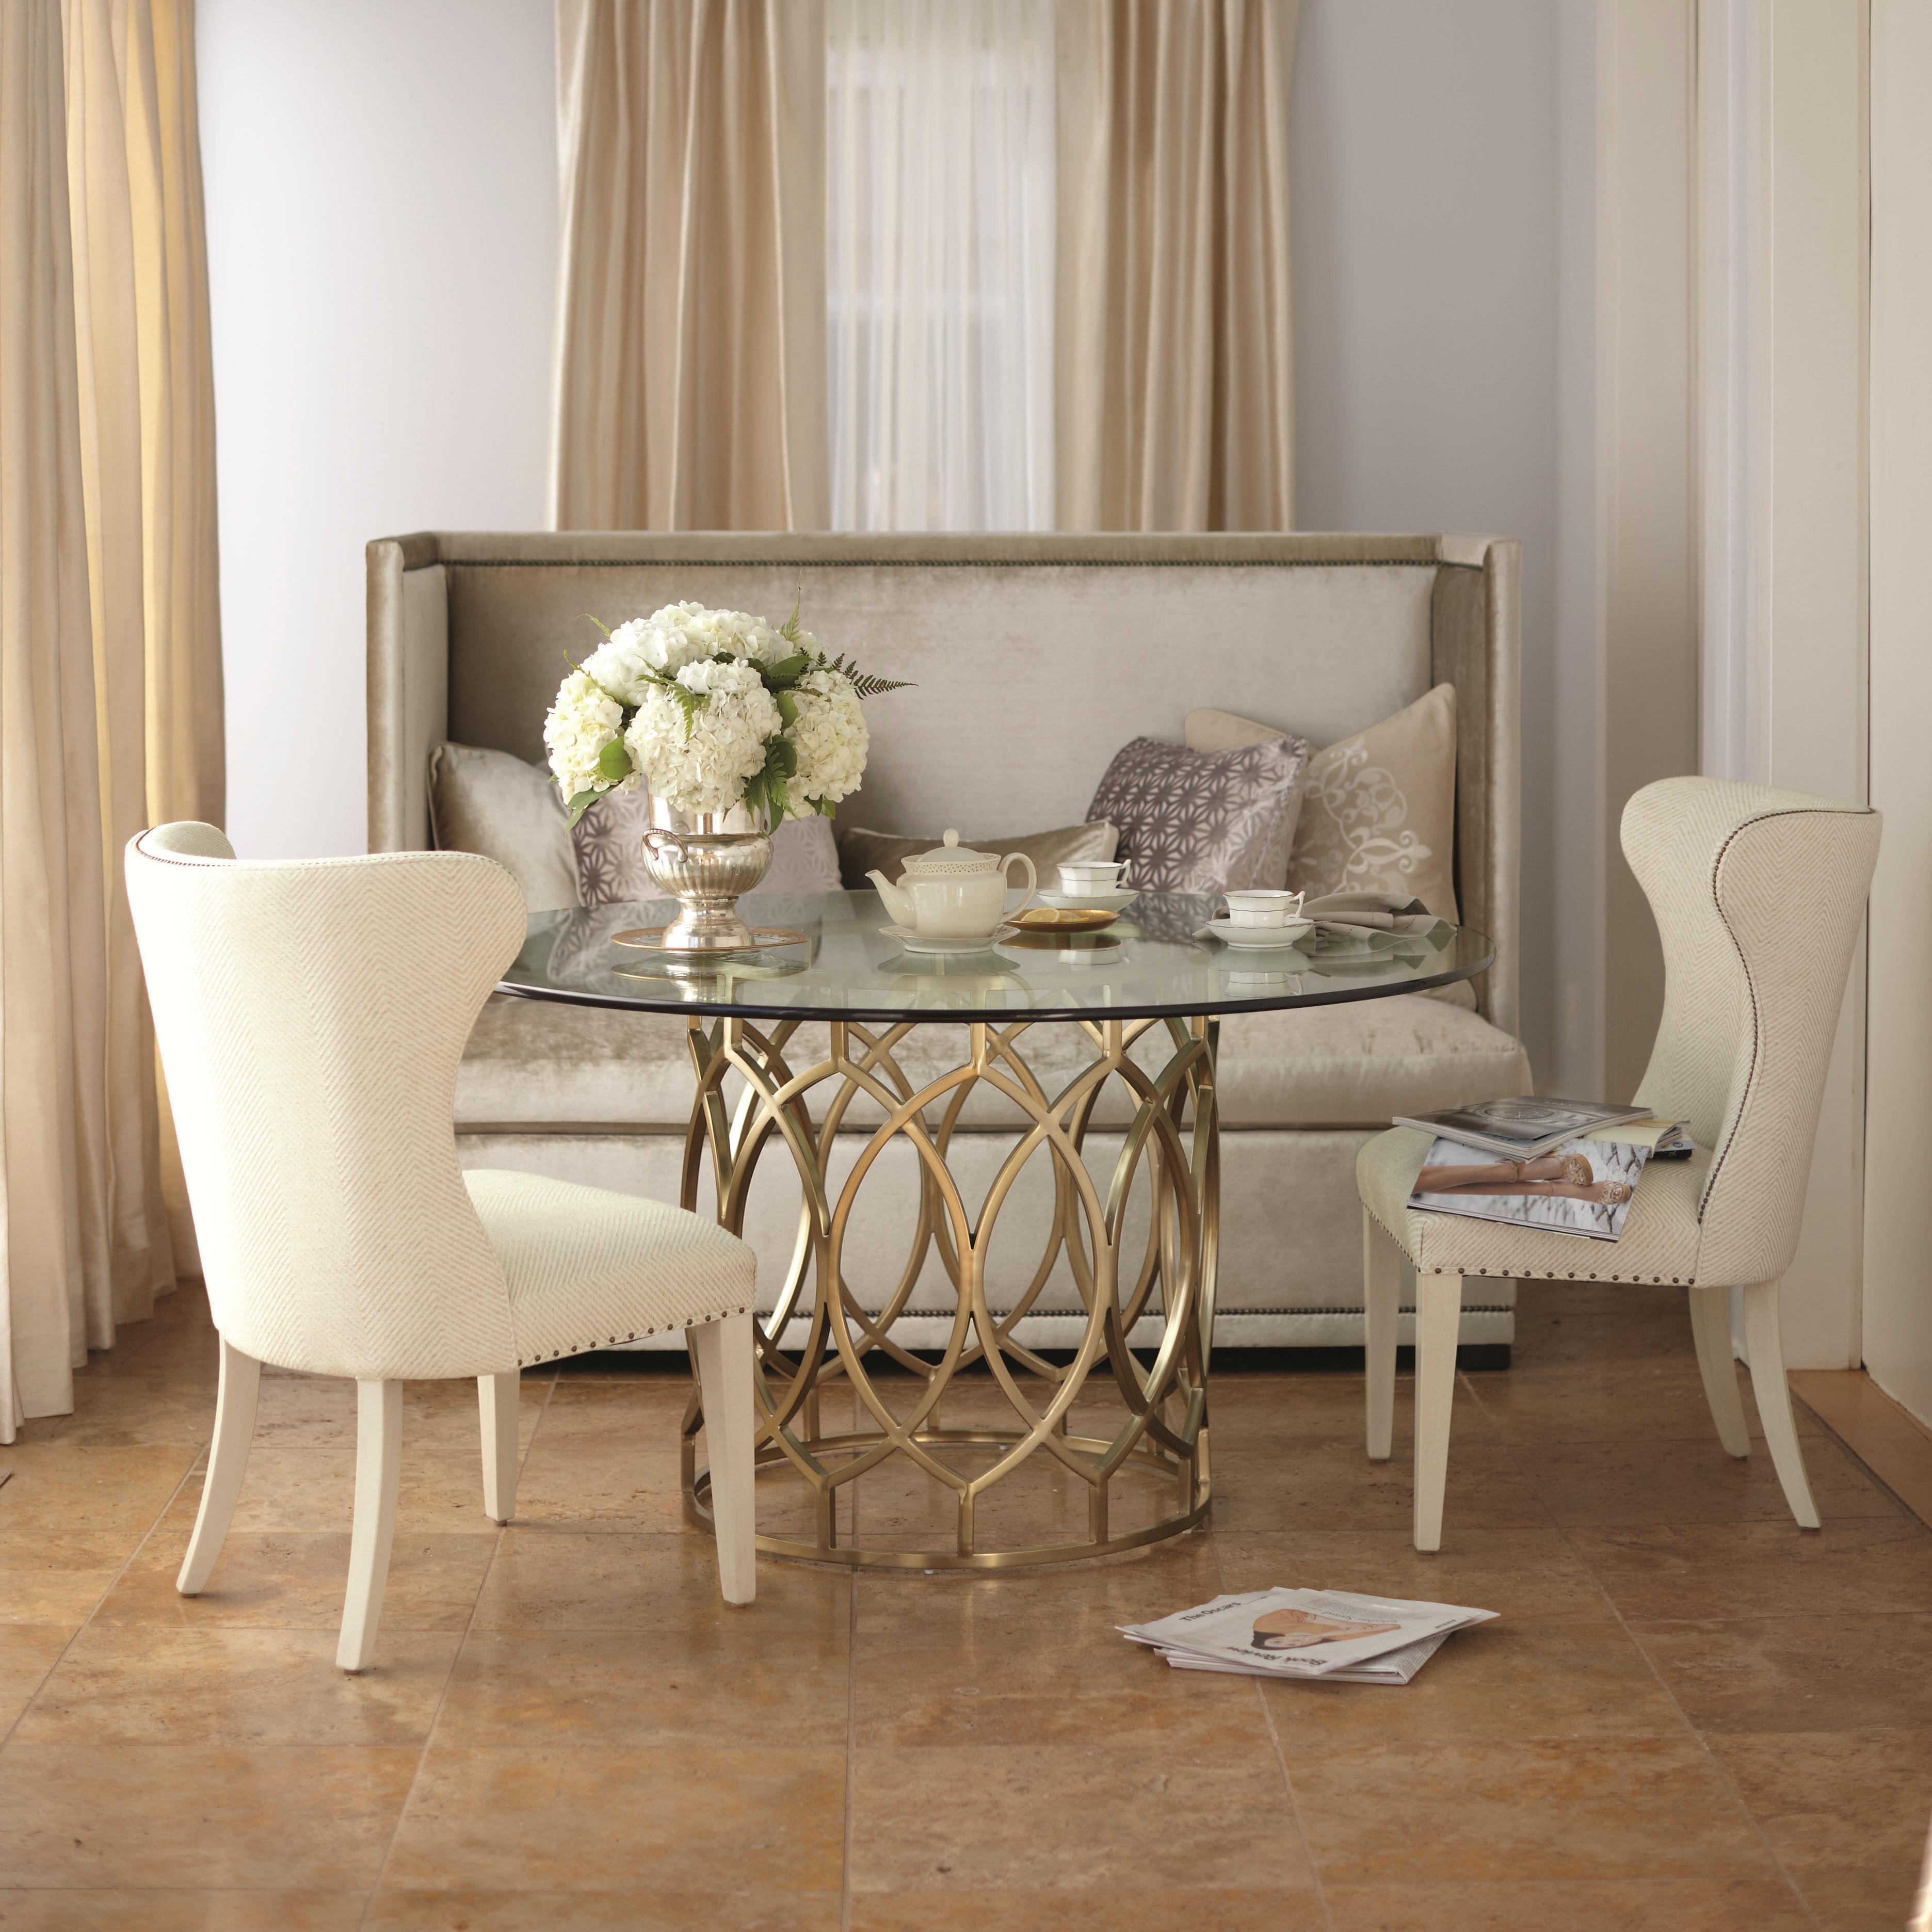 bernhardt salon 3 piece dining set with round glass top